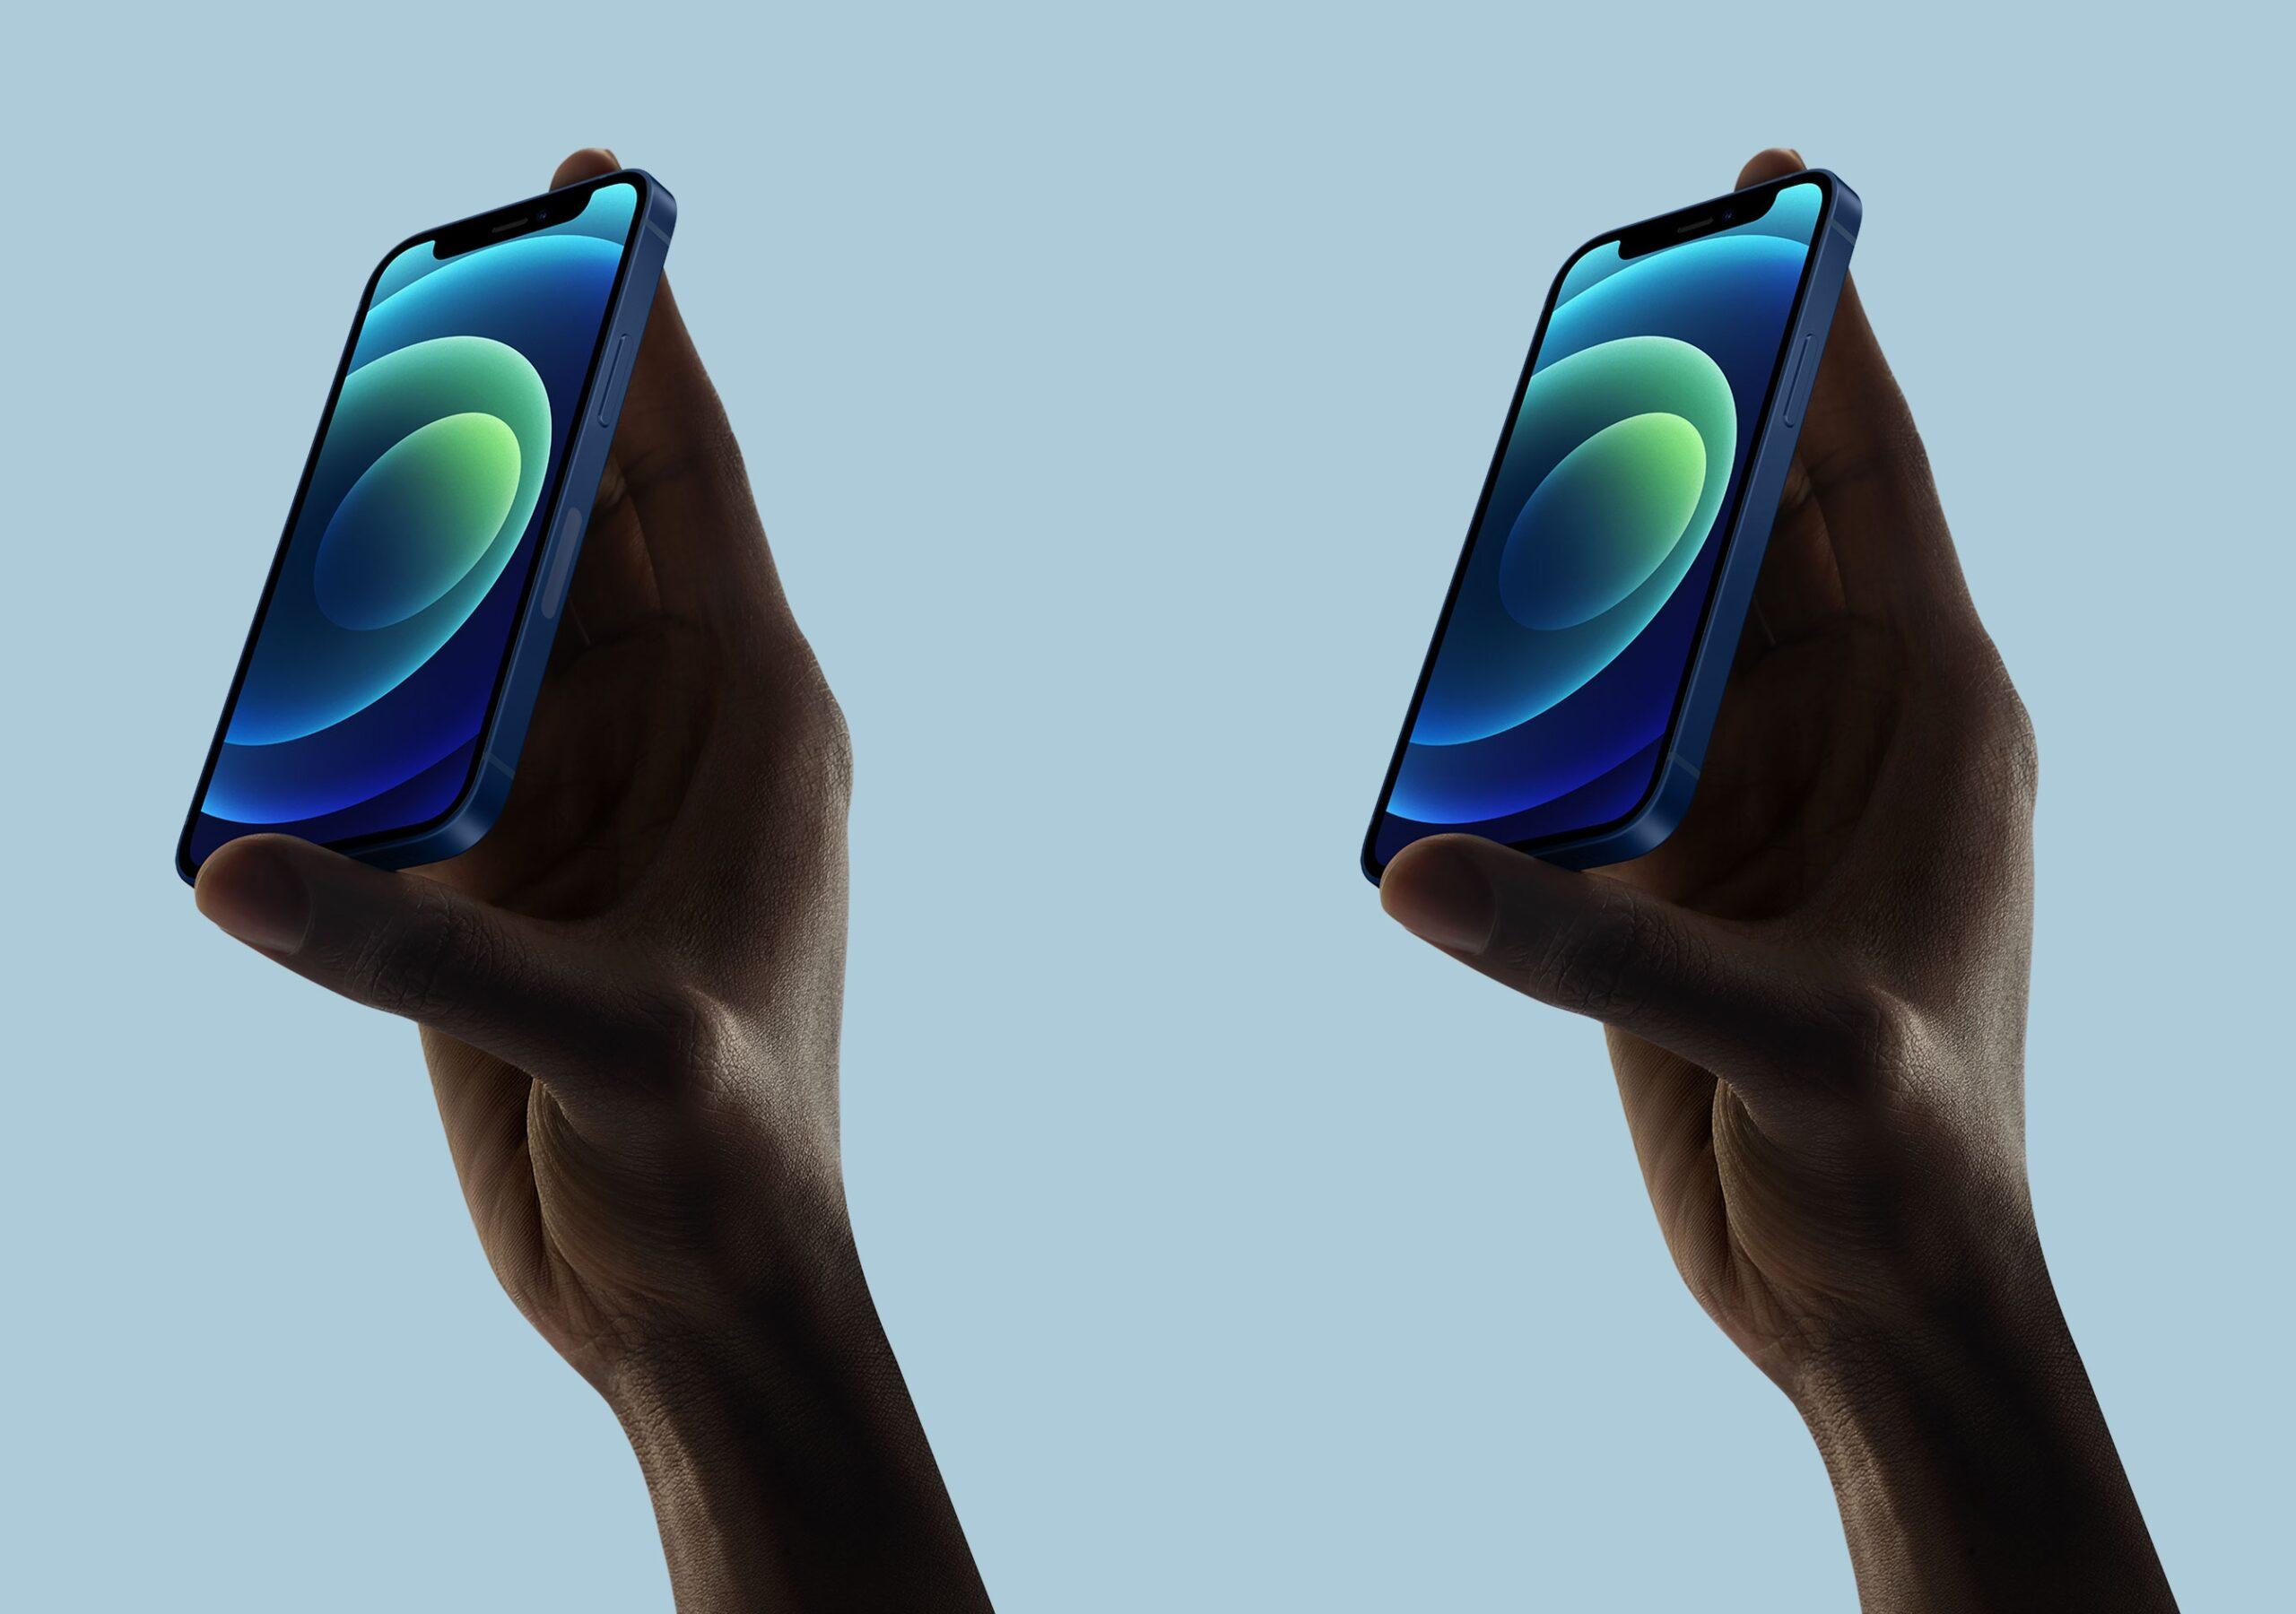 iPhone 12 americano vs. brasileiro (marca do 5G mmWave)